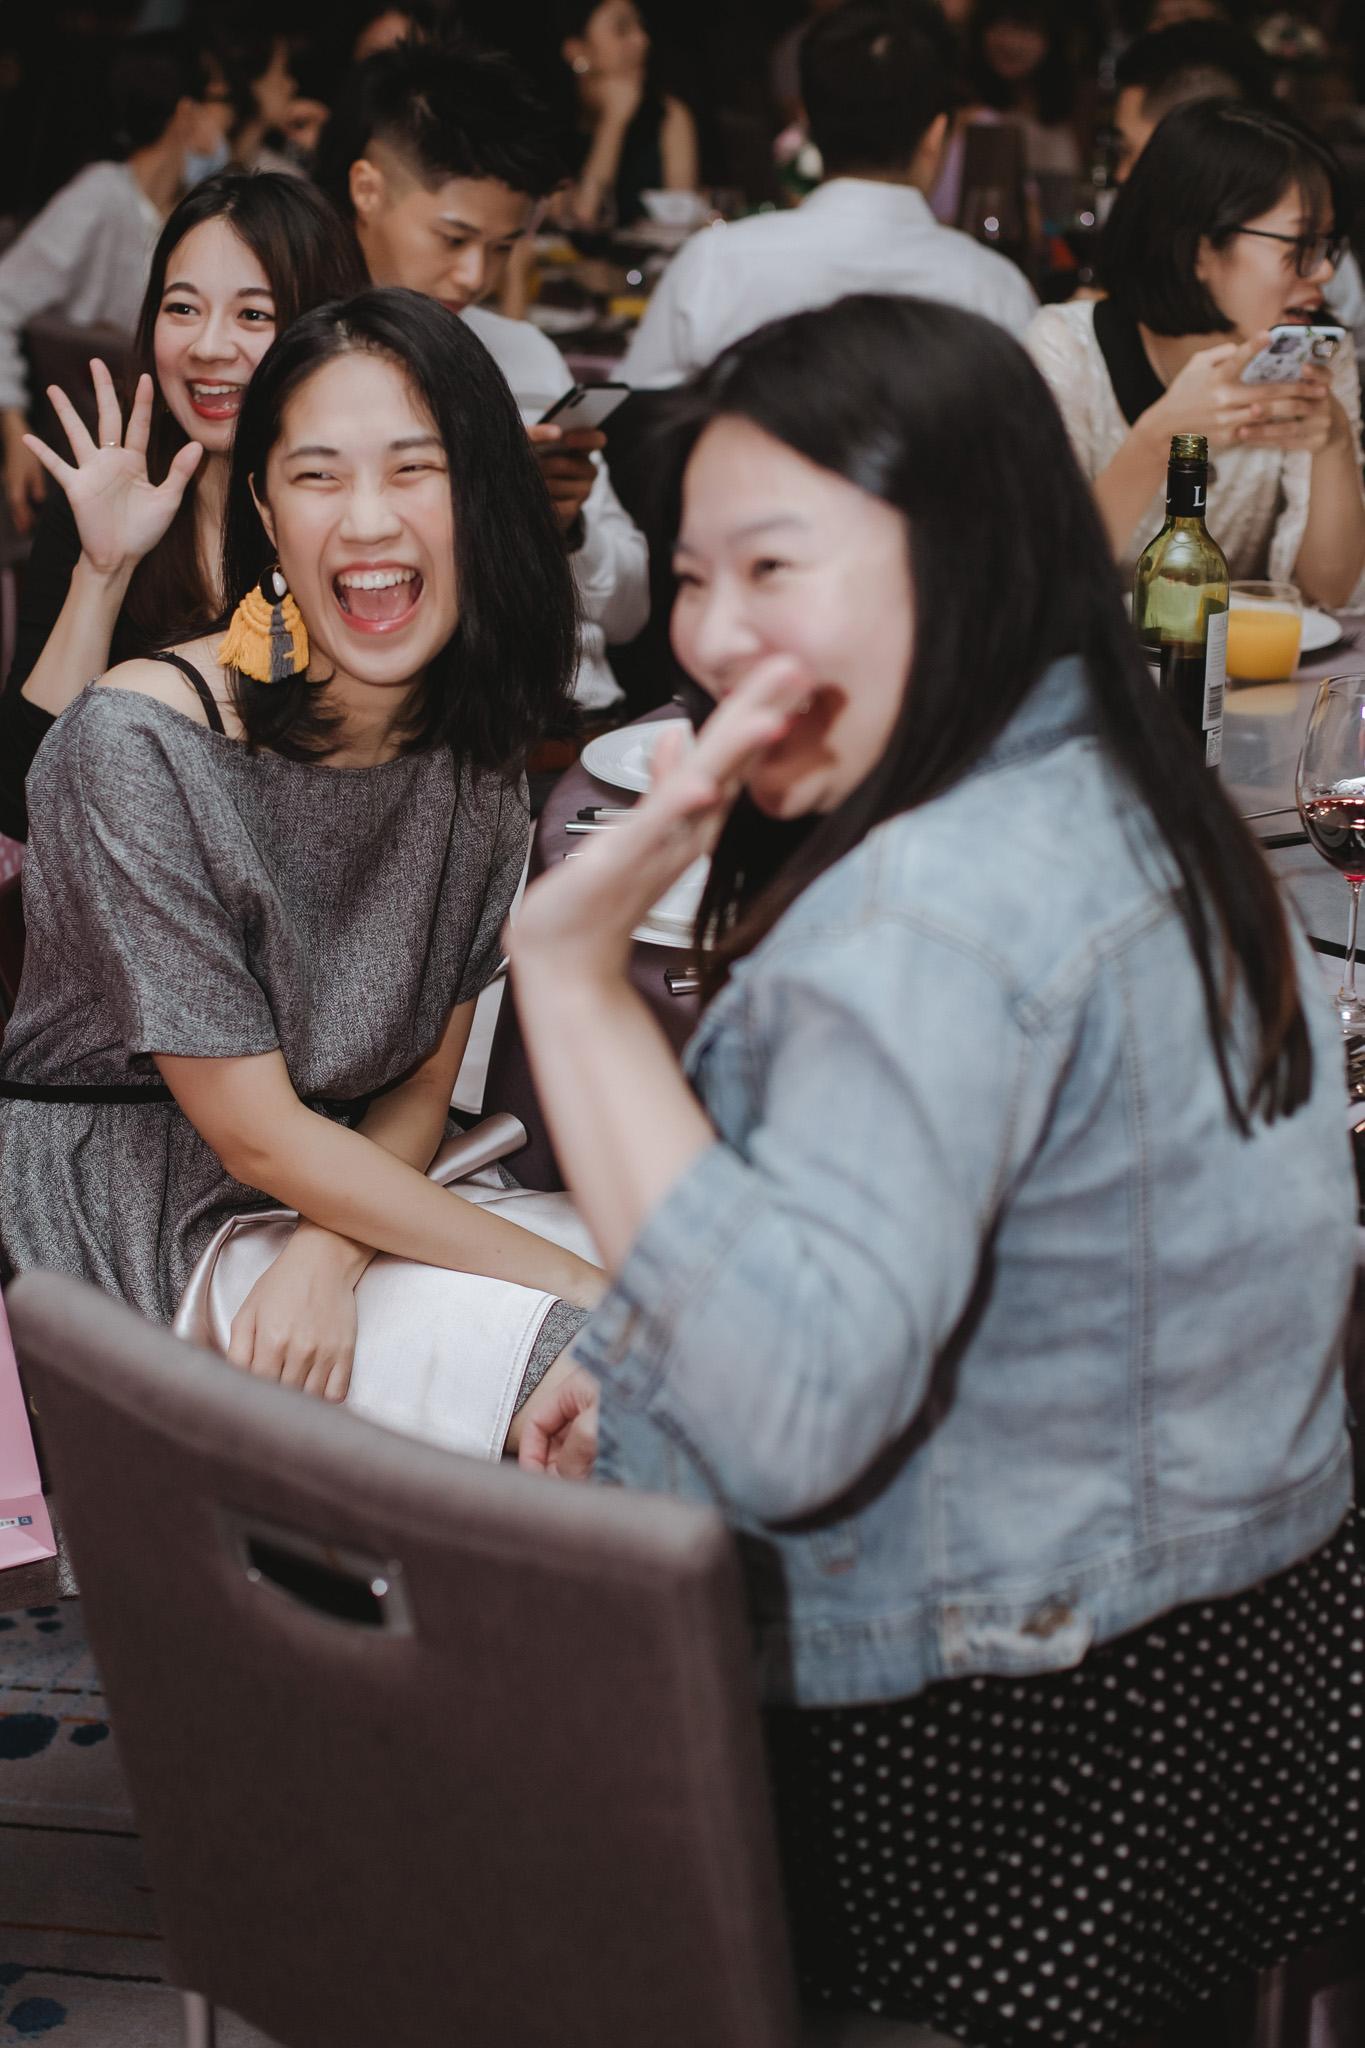 EW 居米 台北禮服 台北婚紗 台北婚攝 國泰萬怡 台北婚禮-25